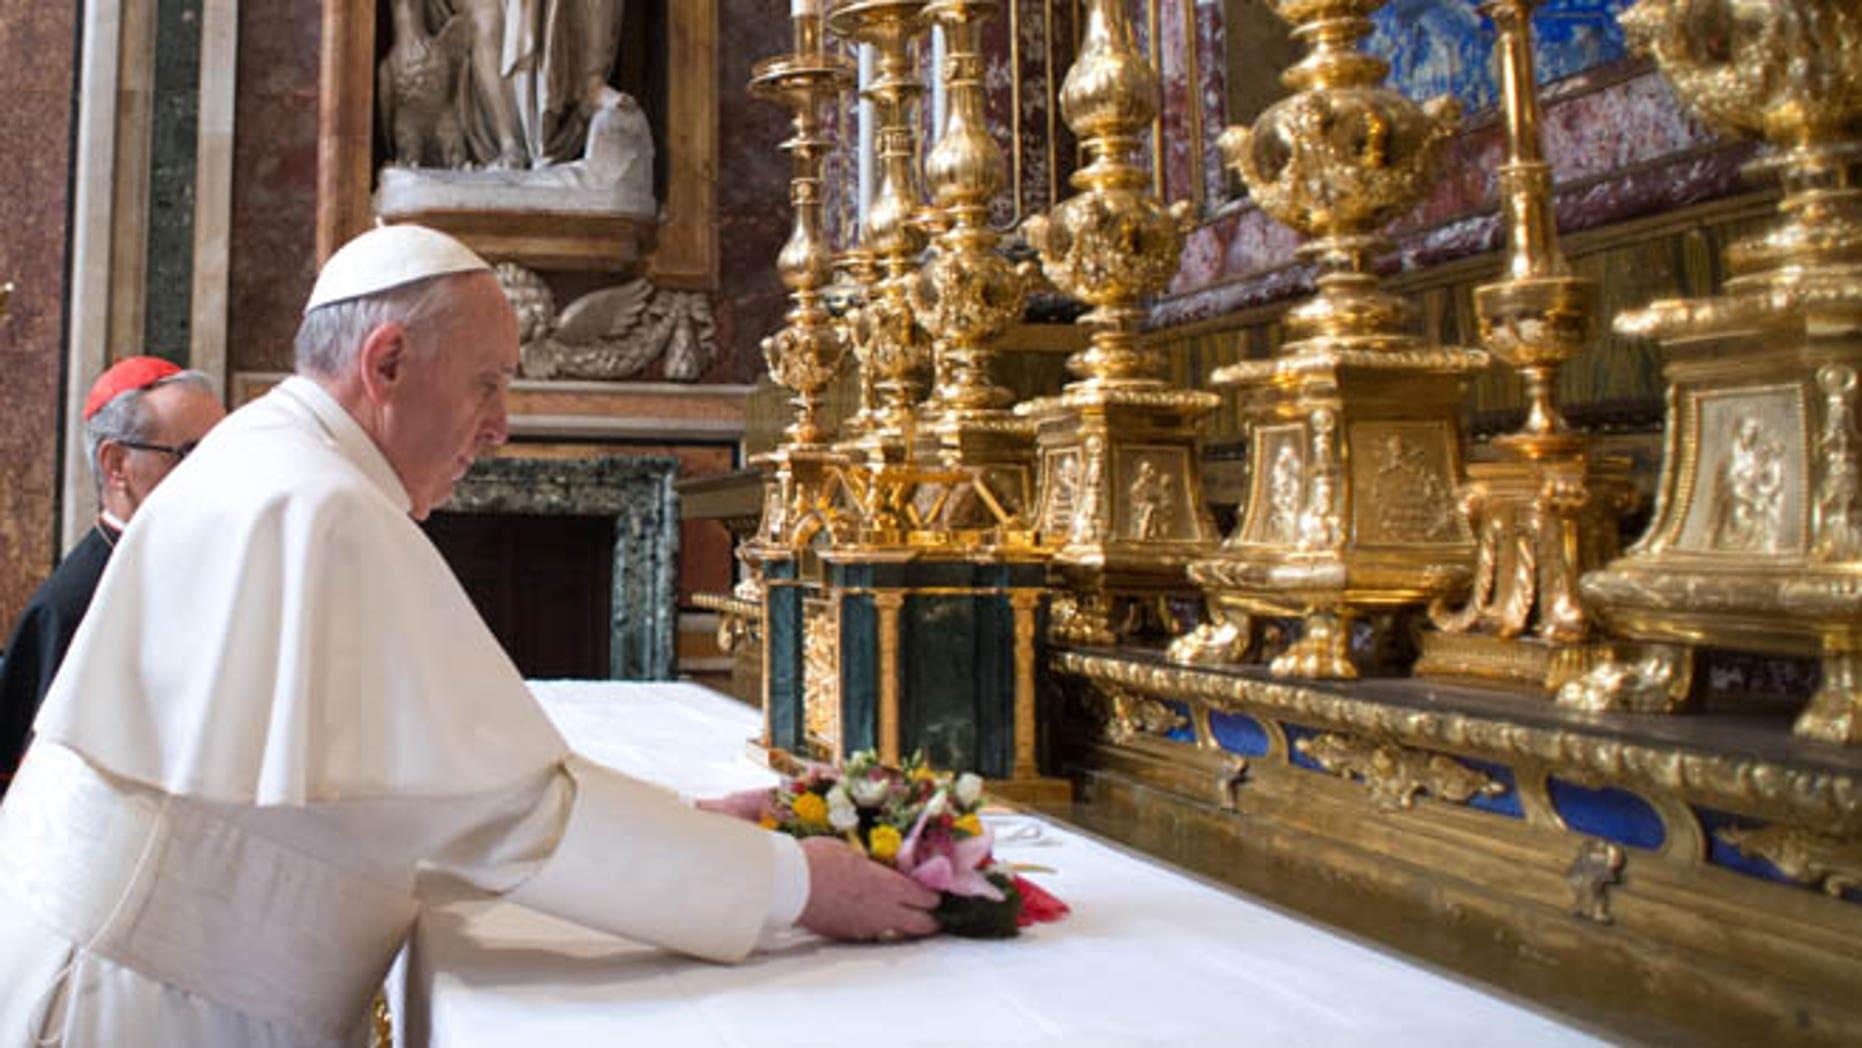 March 14, 2013: Pope Francis makes a private visit to the 5th-century Basilica of Santa Maria Maggiore in Rome.